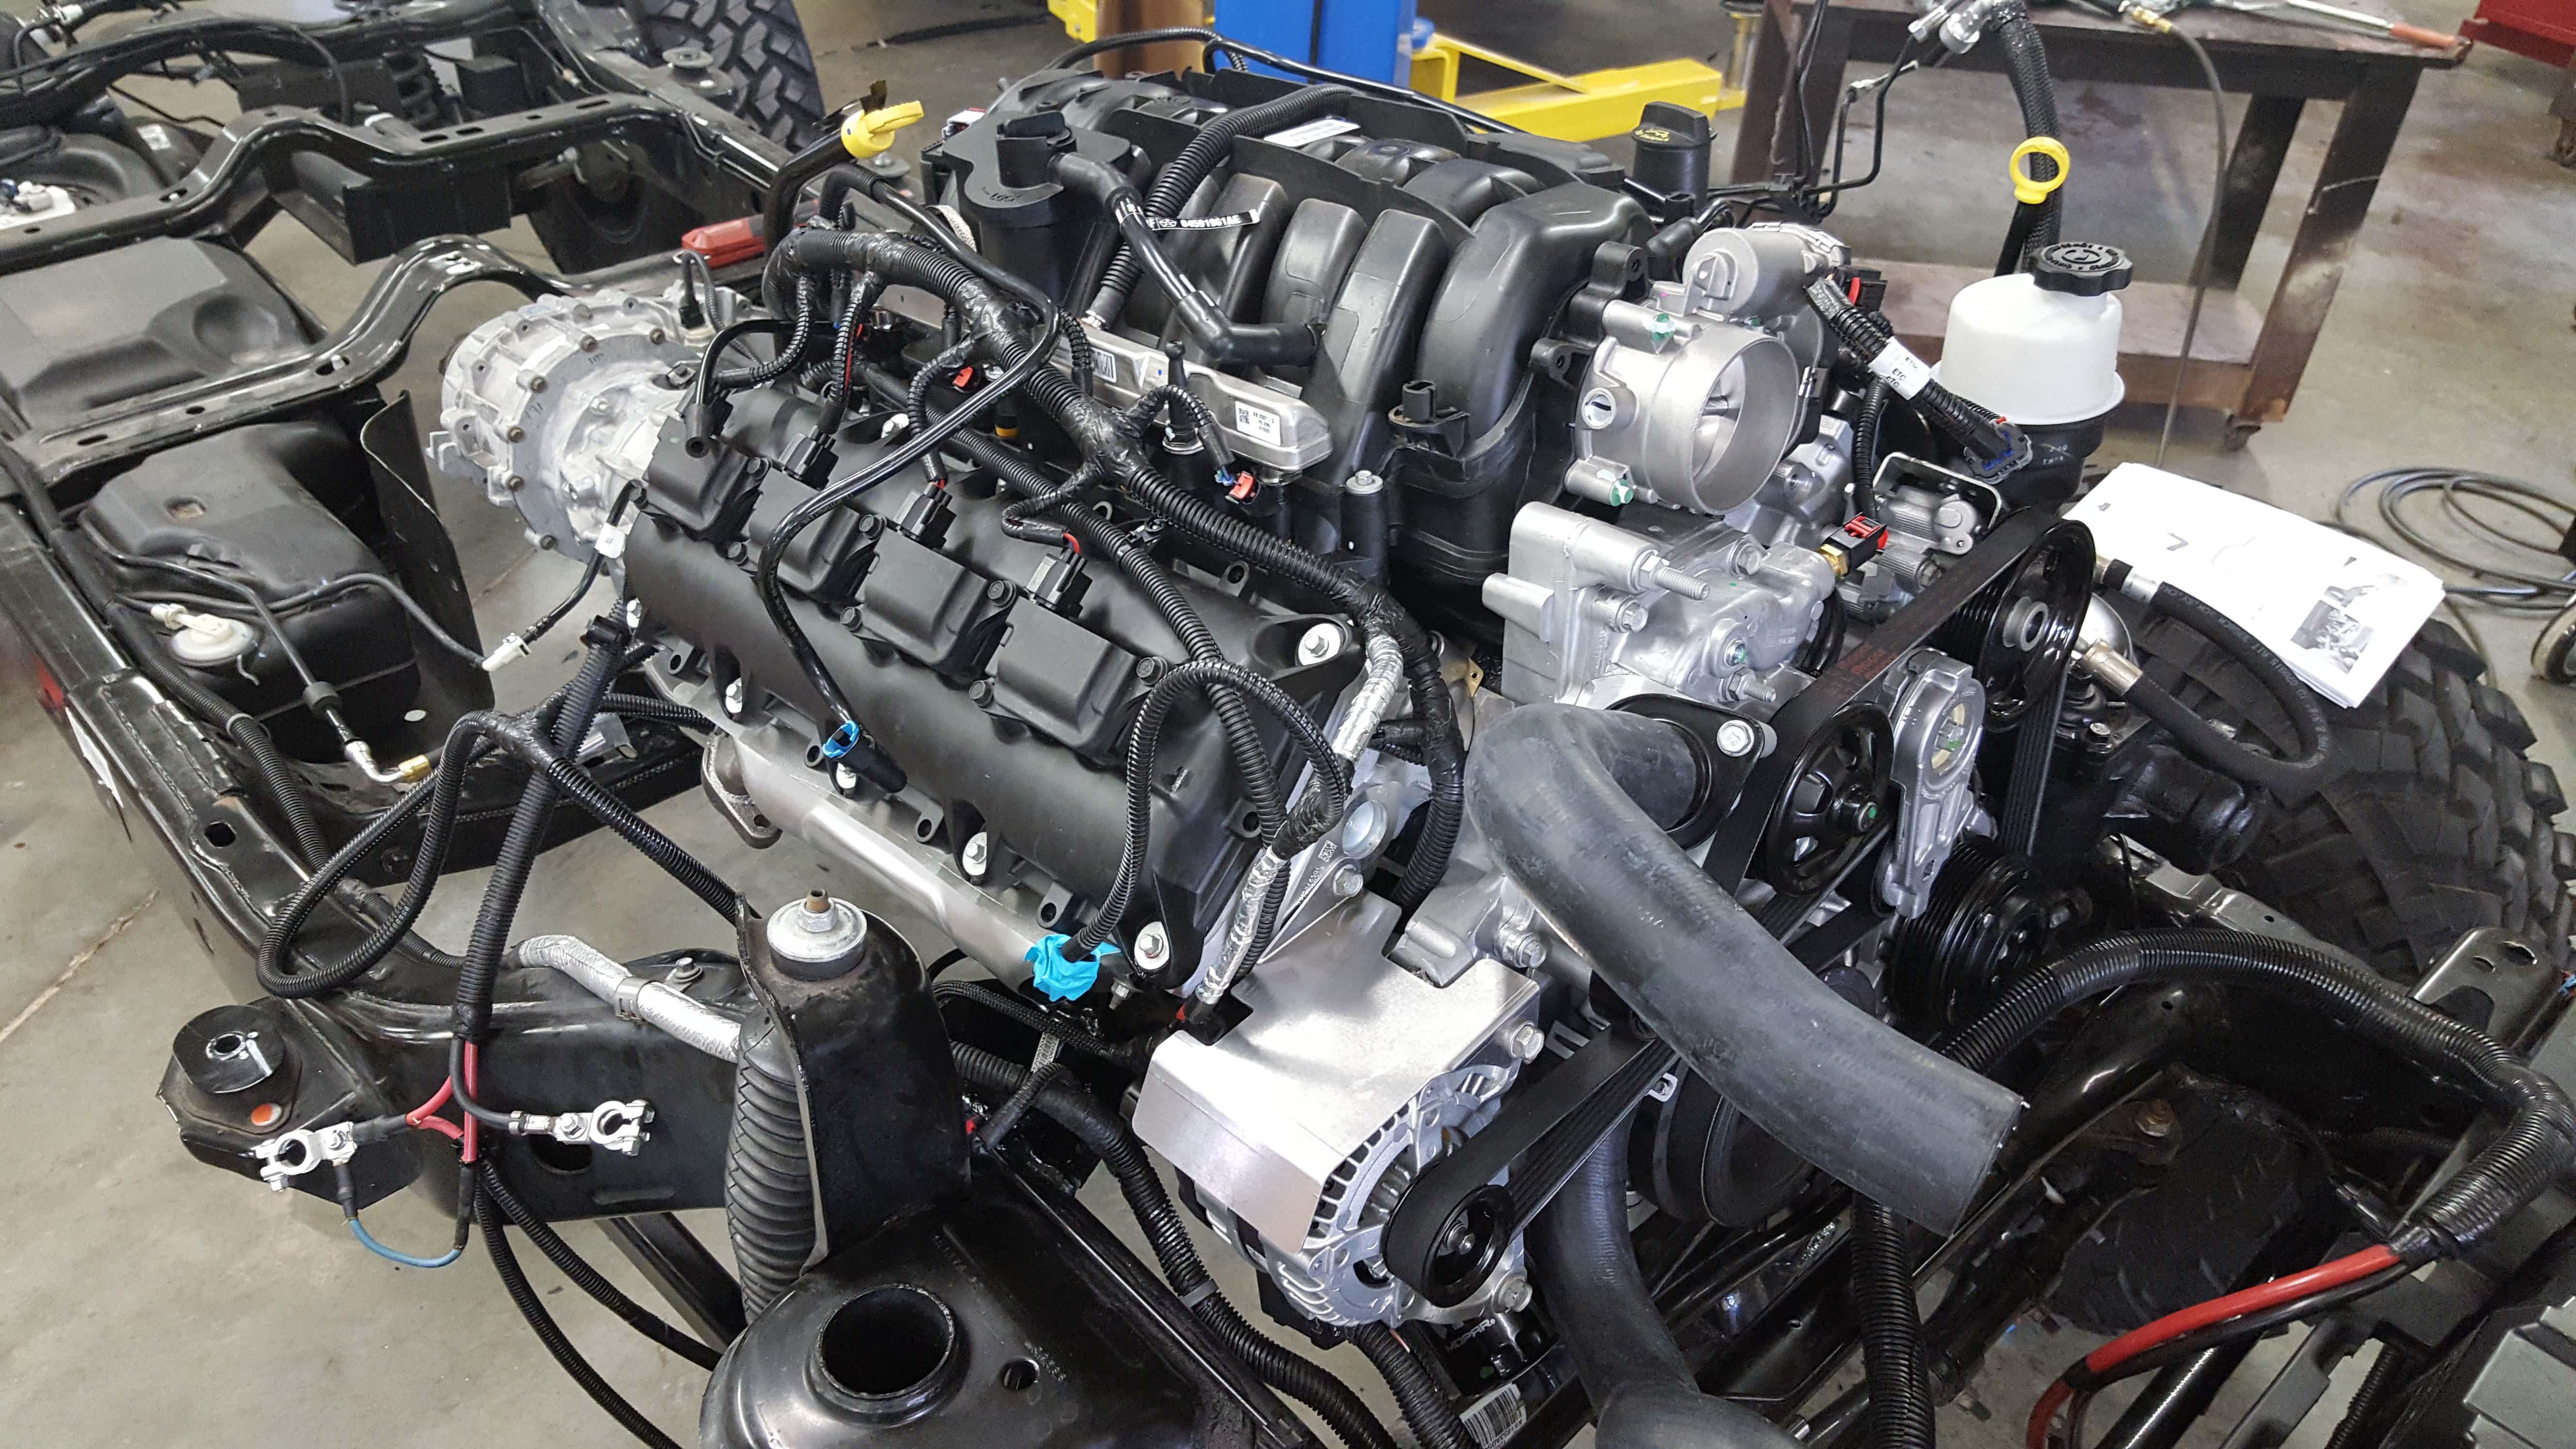 2008 Jeep Wrangler Engine Wiring Harness Jk Hemi Conversion Kit Nuthouse Industries